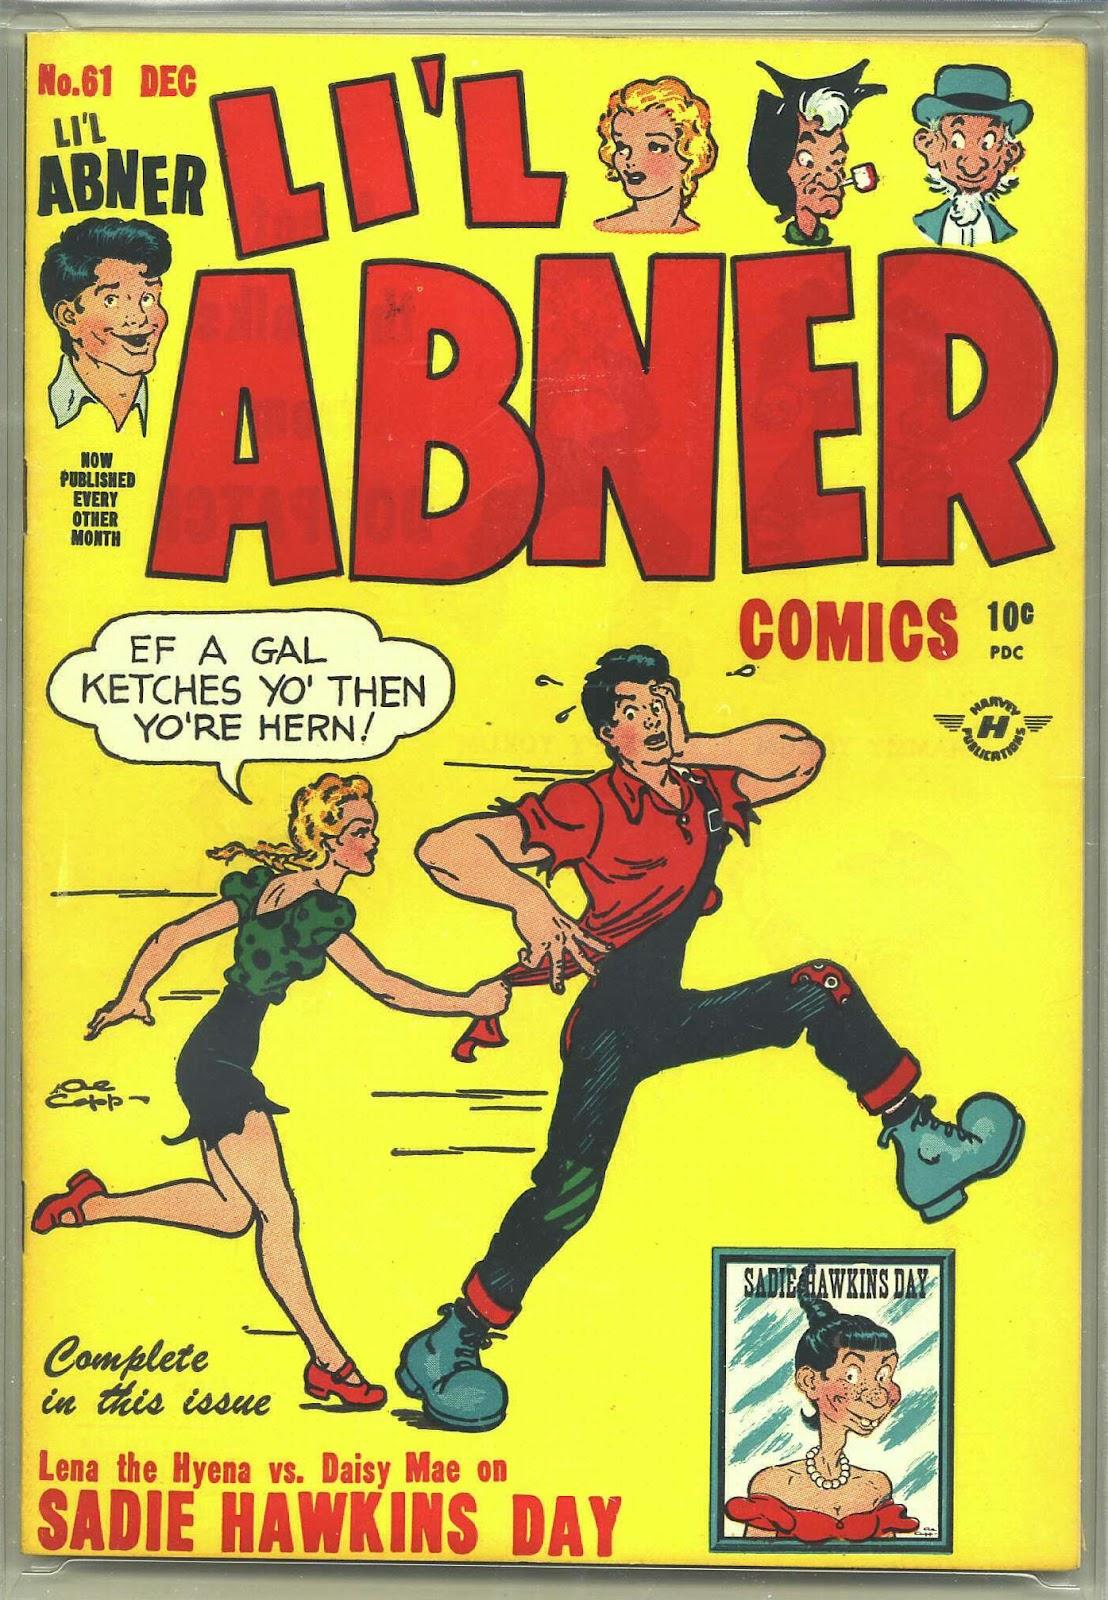 Lil Abner Comics 61 Page 1